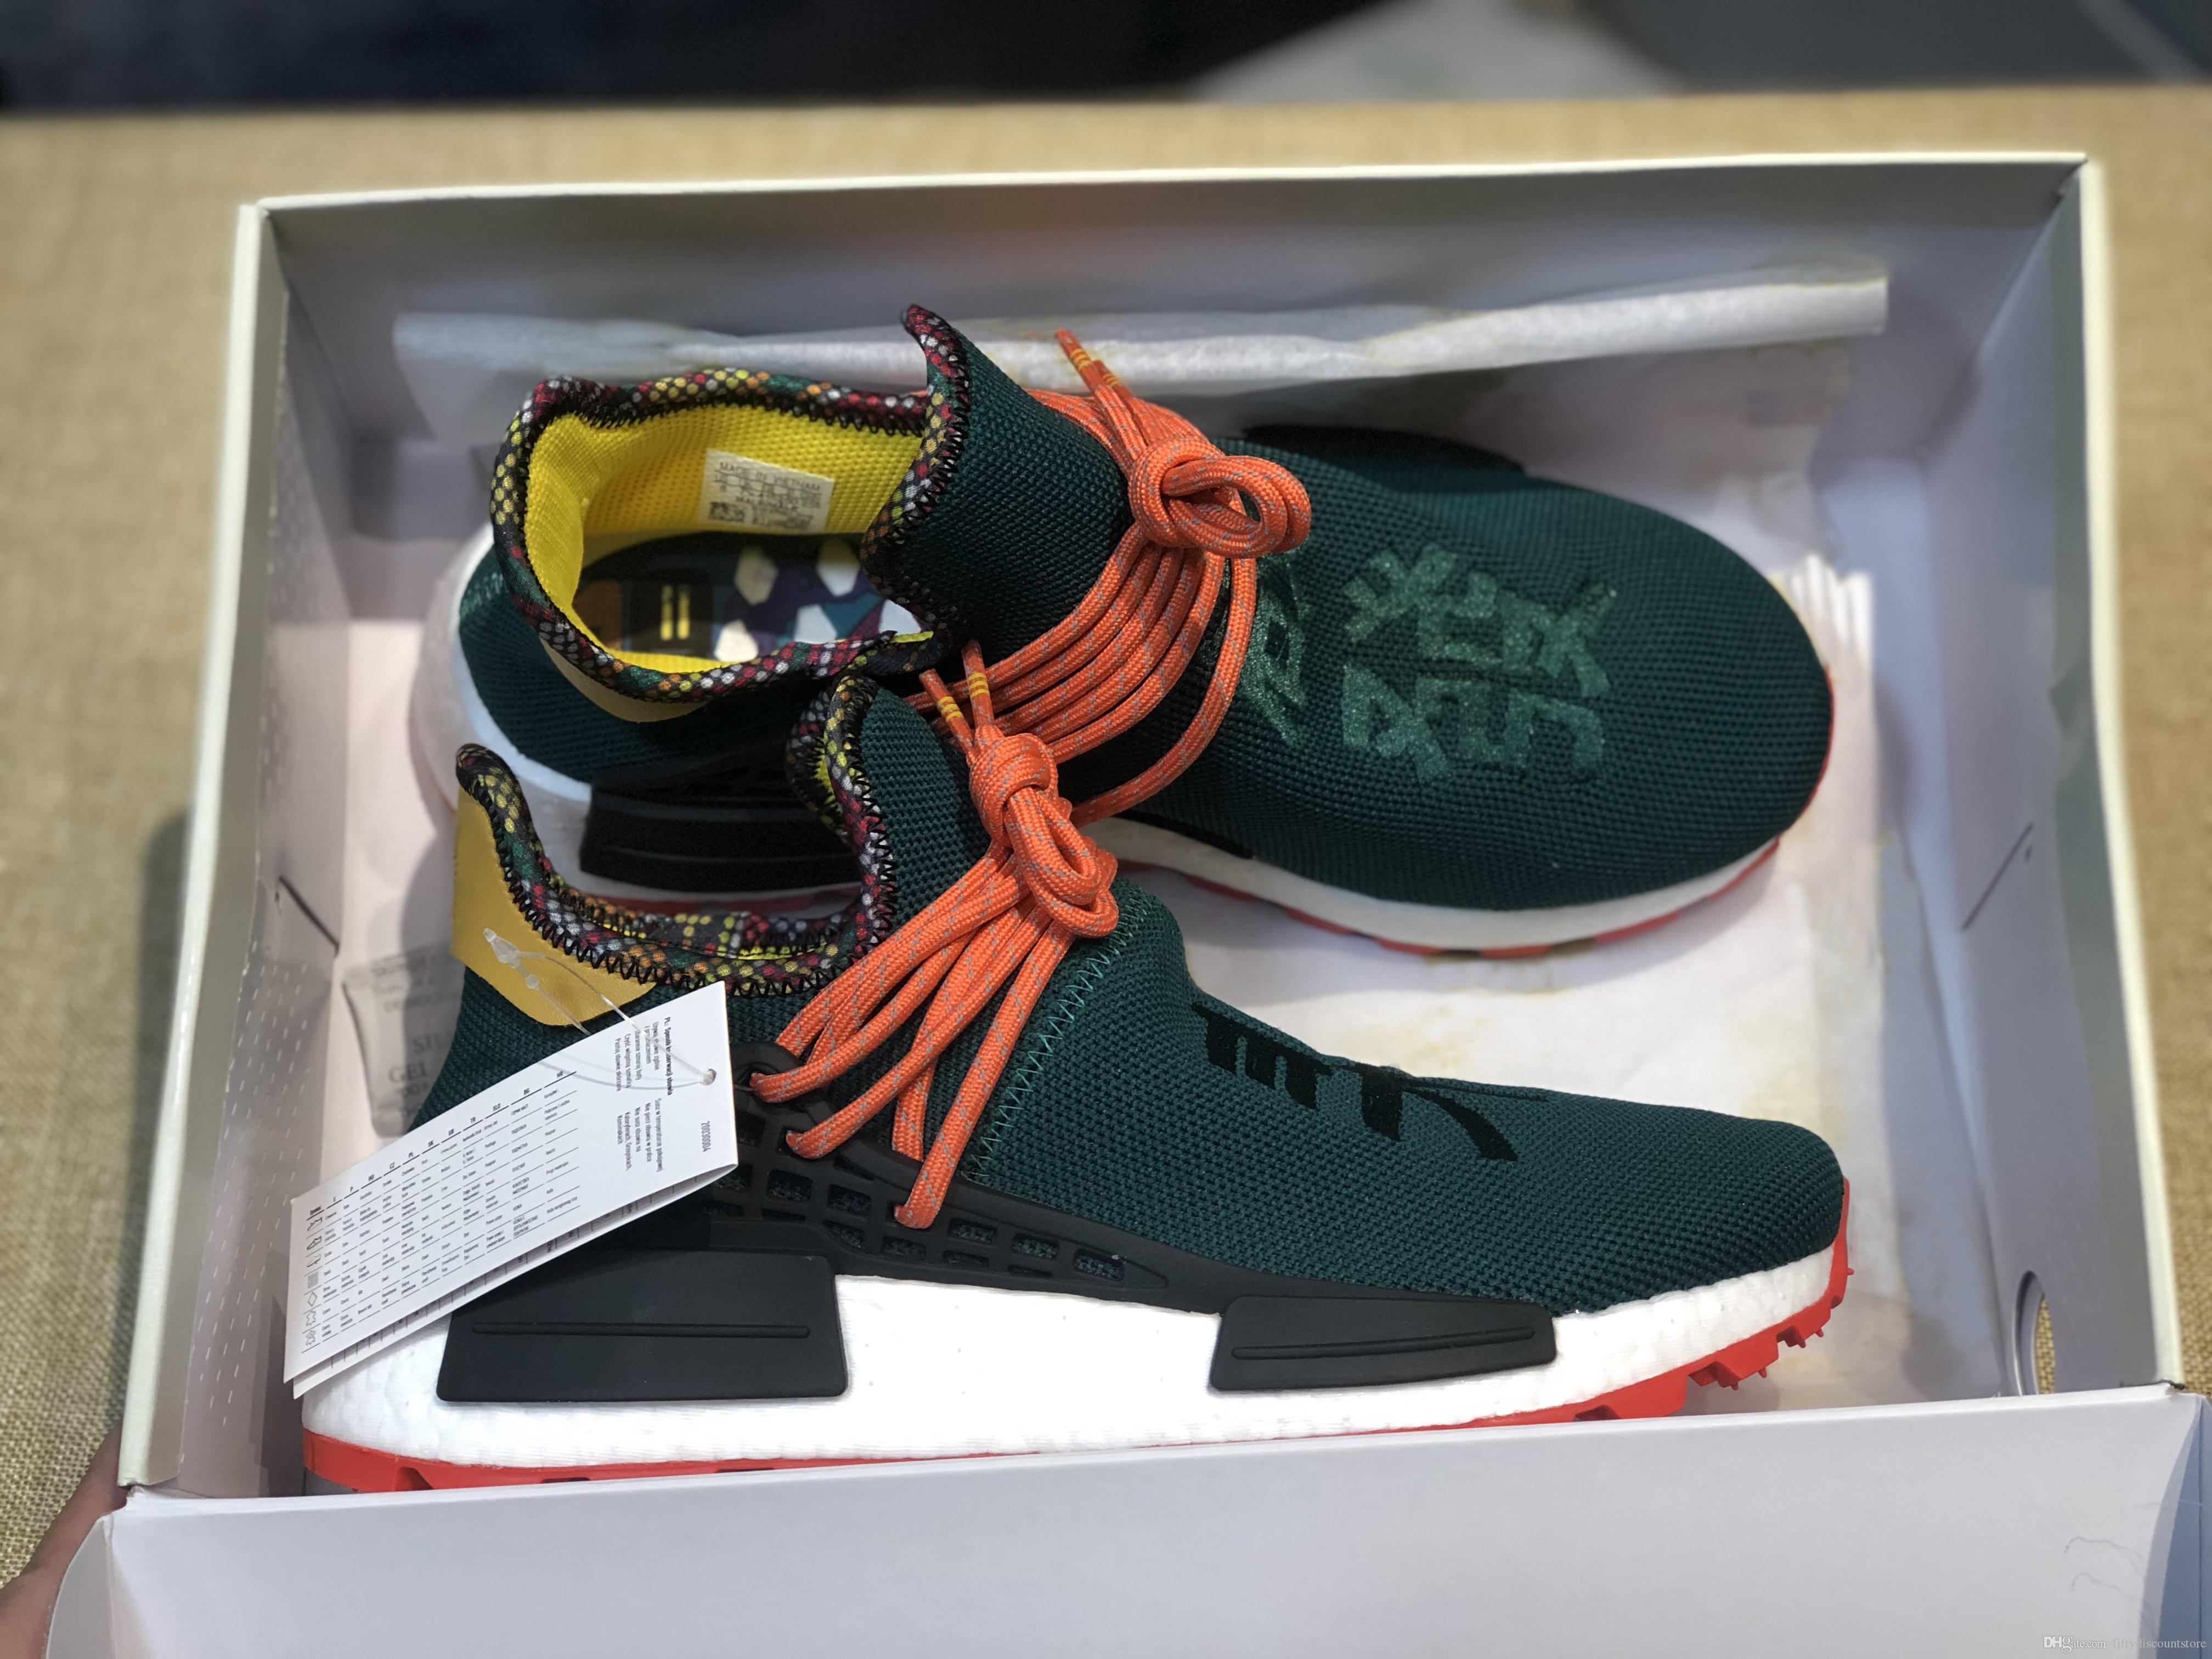 Calidad superior 2019 Humanrace Hu Inspiration Pack zapatillas reales basf inferior calidad superior Pharrell Williams entrenador Zapatillas con caja 36-45